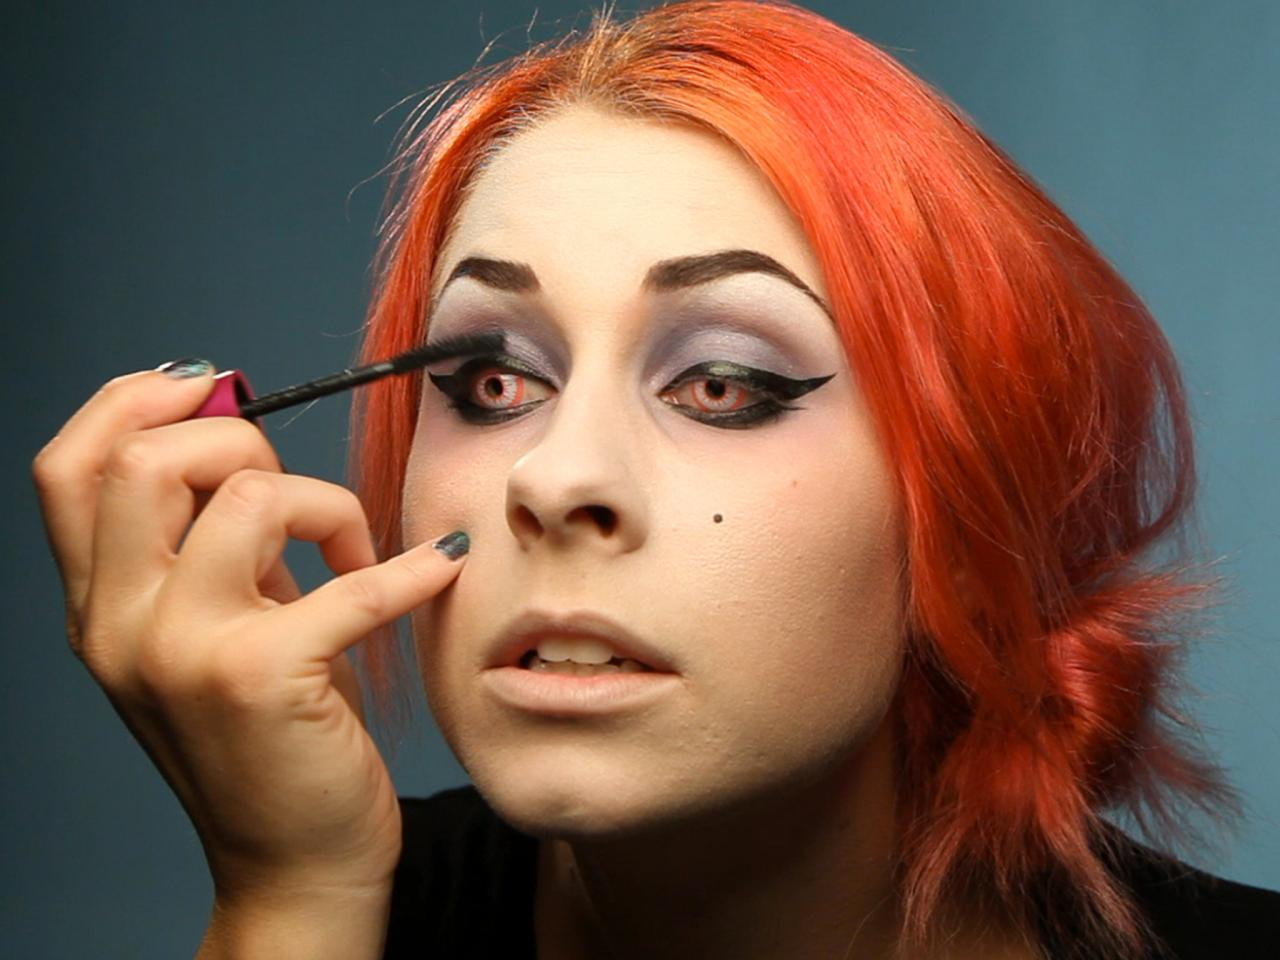 enhancing your glam dark fairy halloween look with black eyeliner